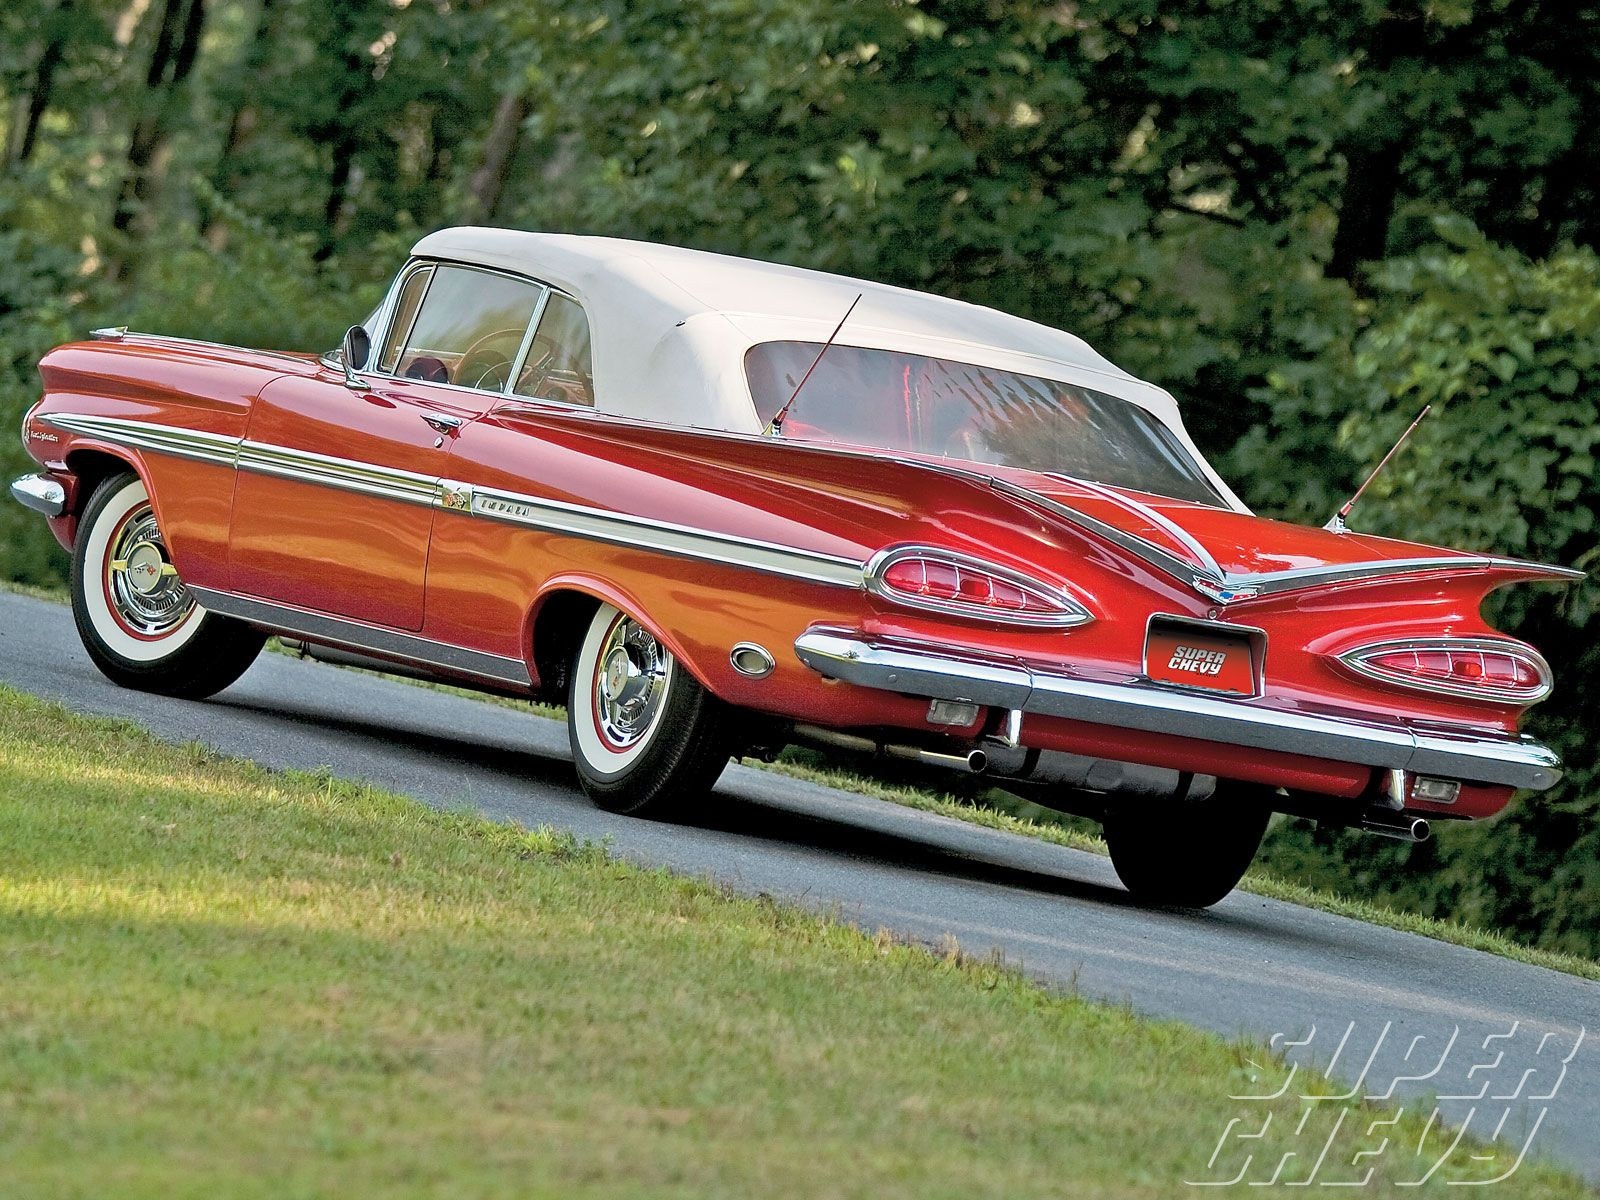 medium resolution of 1959 chevrolet impala scott chalk 1959 chevrolet impala convertible driver side rear view